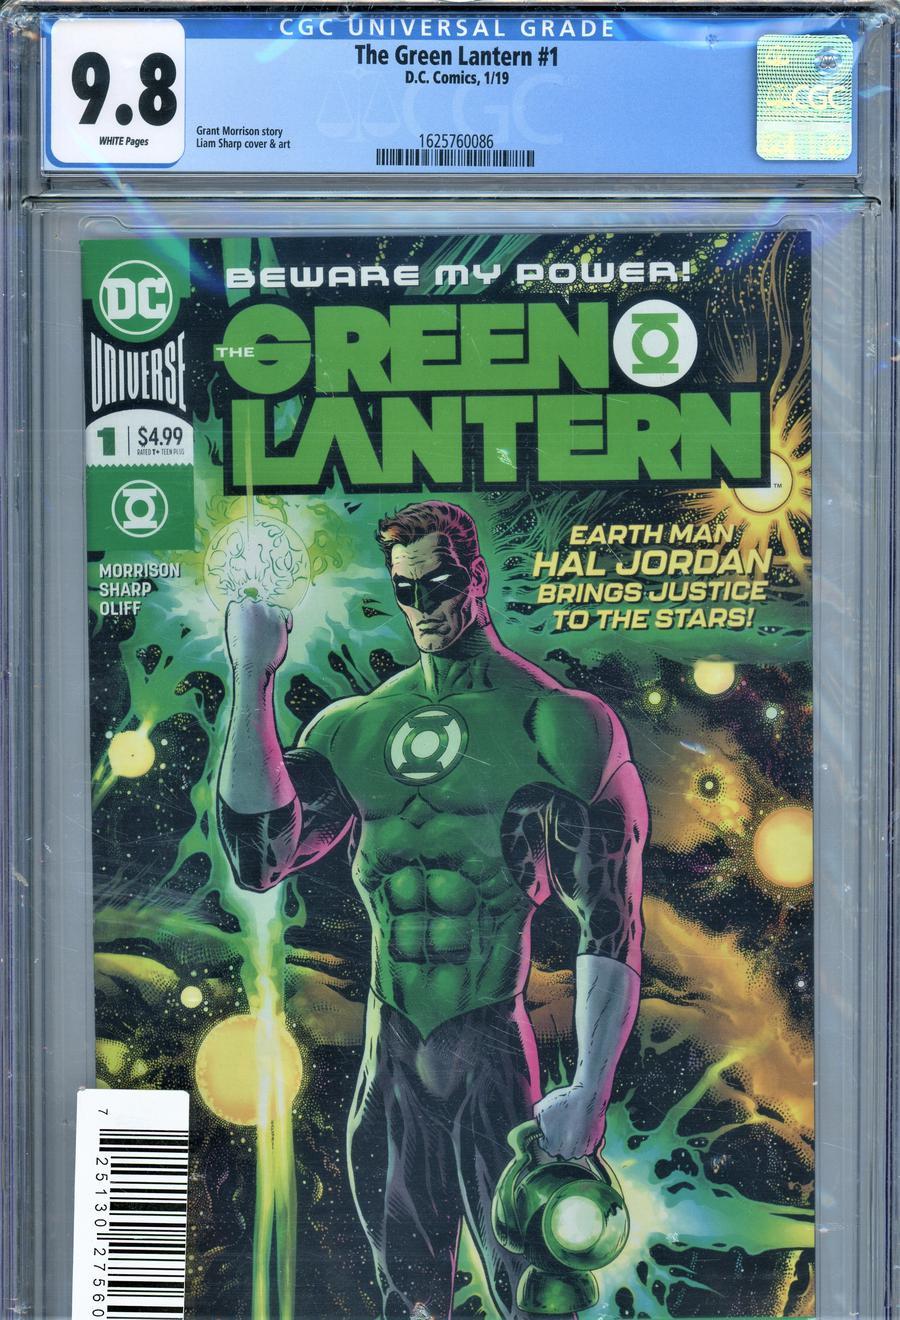 Green Lantern Vol 6 #1 Cover G DF CGC Graded